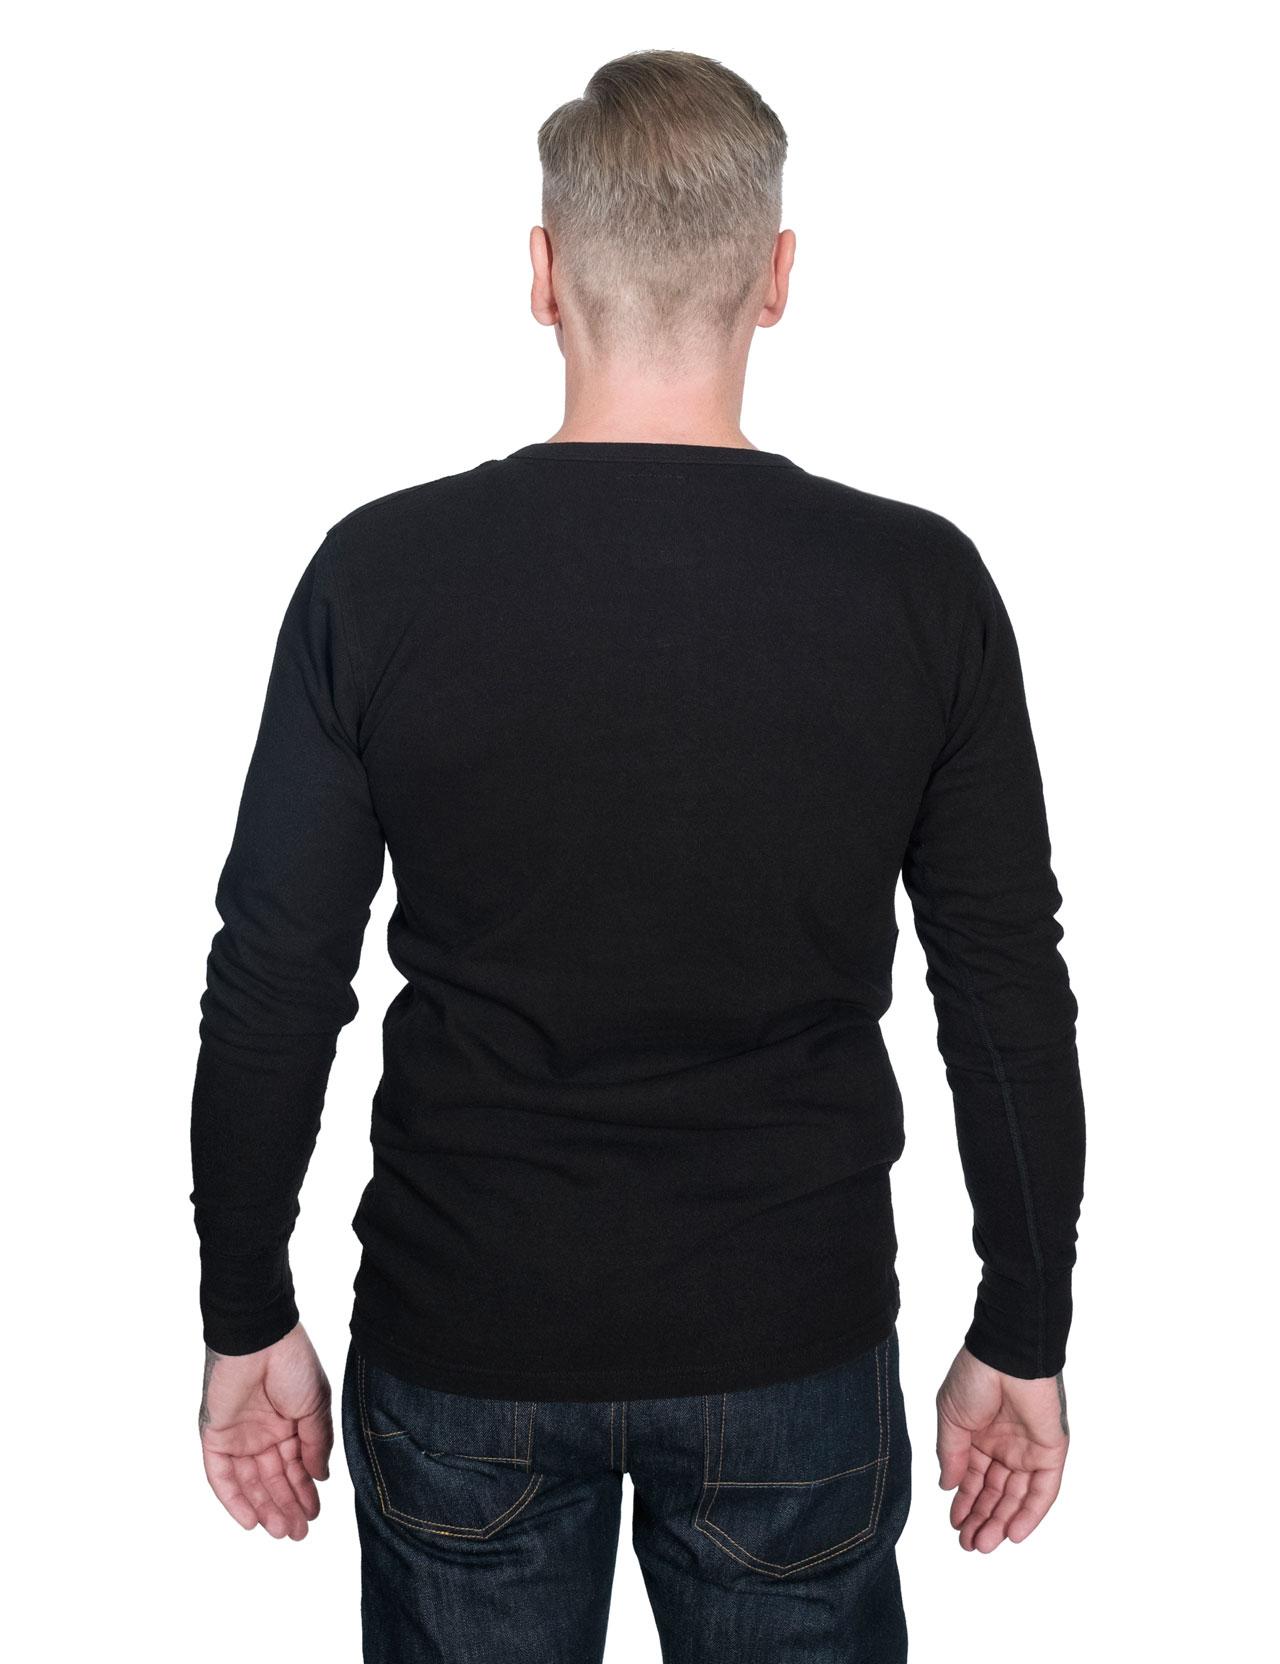 Homespun Knitwear - Lot 003 Surplus Henley Long Sleeve - Aged Black